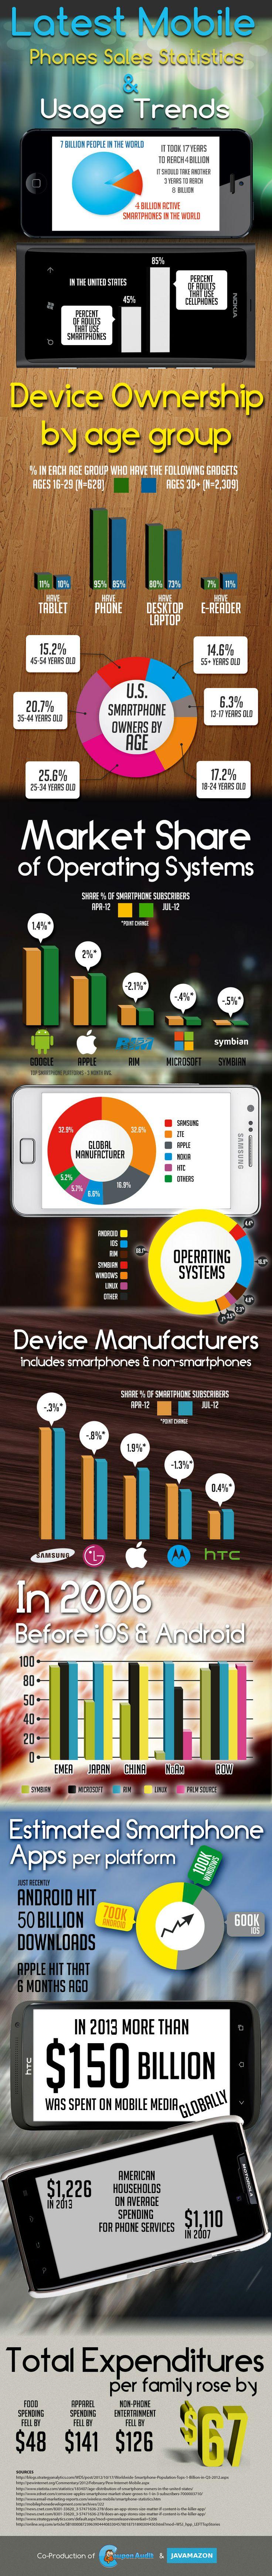 Infographic – Latest Mobile Phones Sales Statistics & Usage Trends